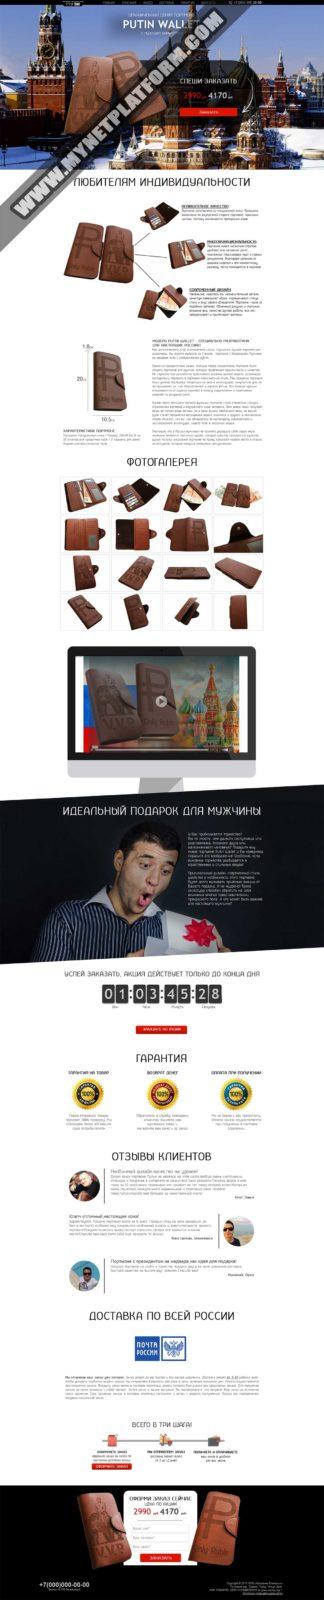 Скриншот лендинга Портмоне Putin Wallet 001